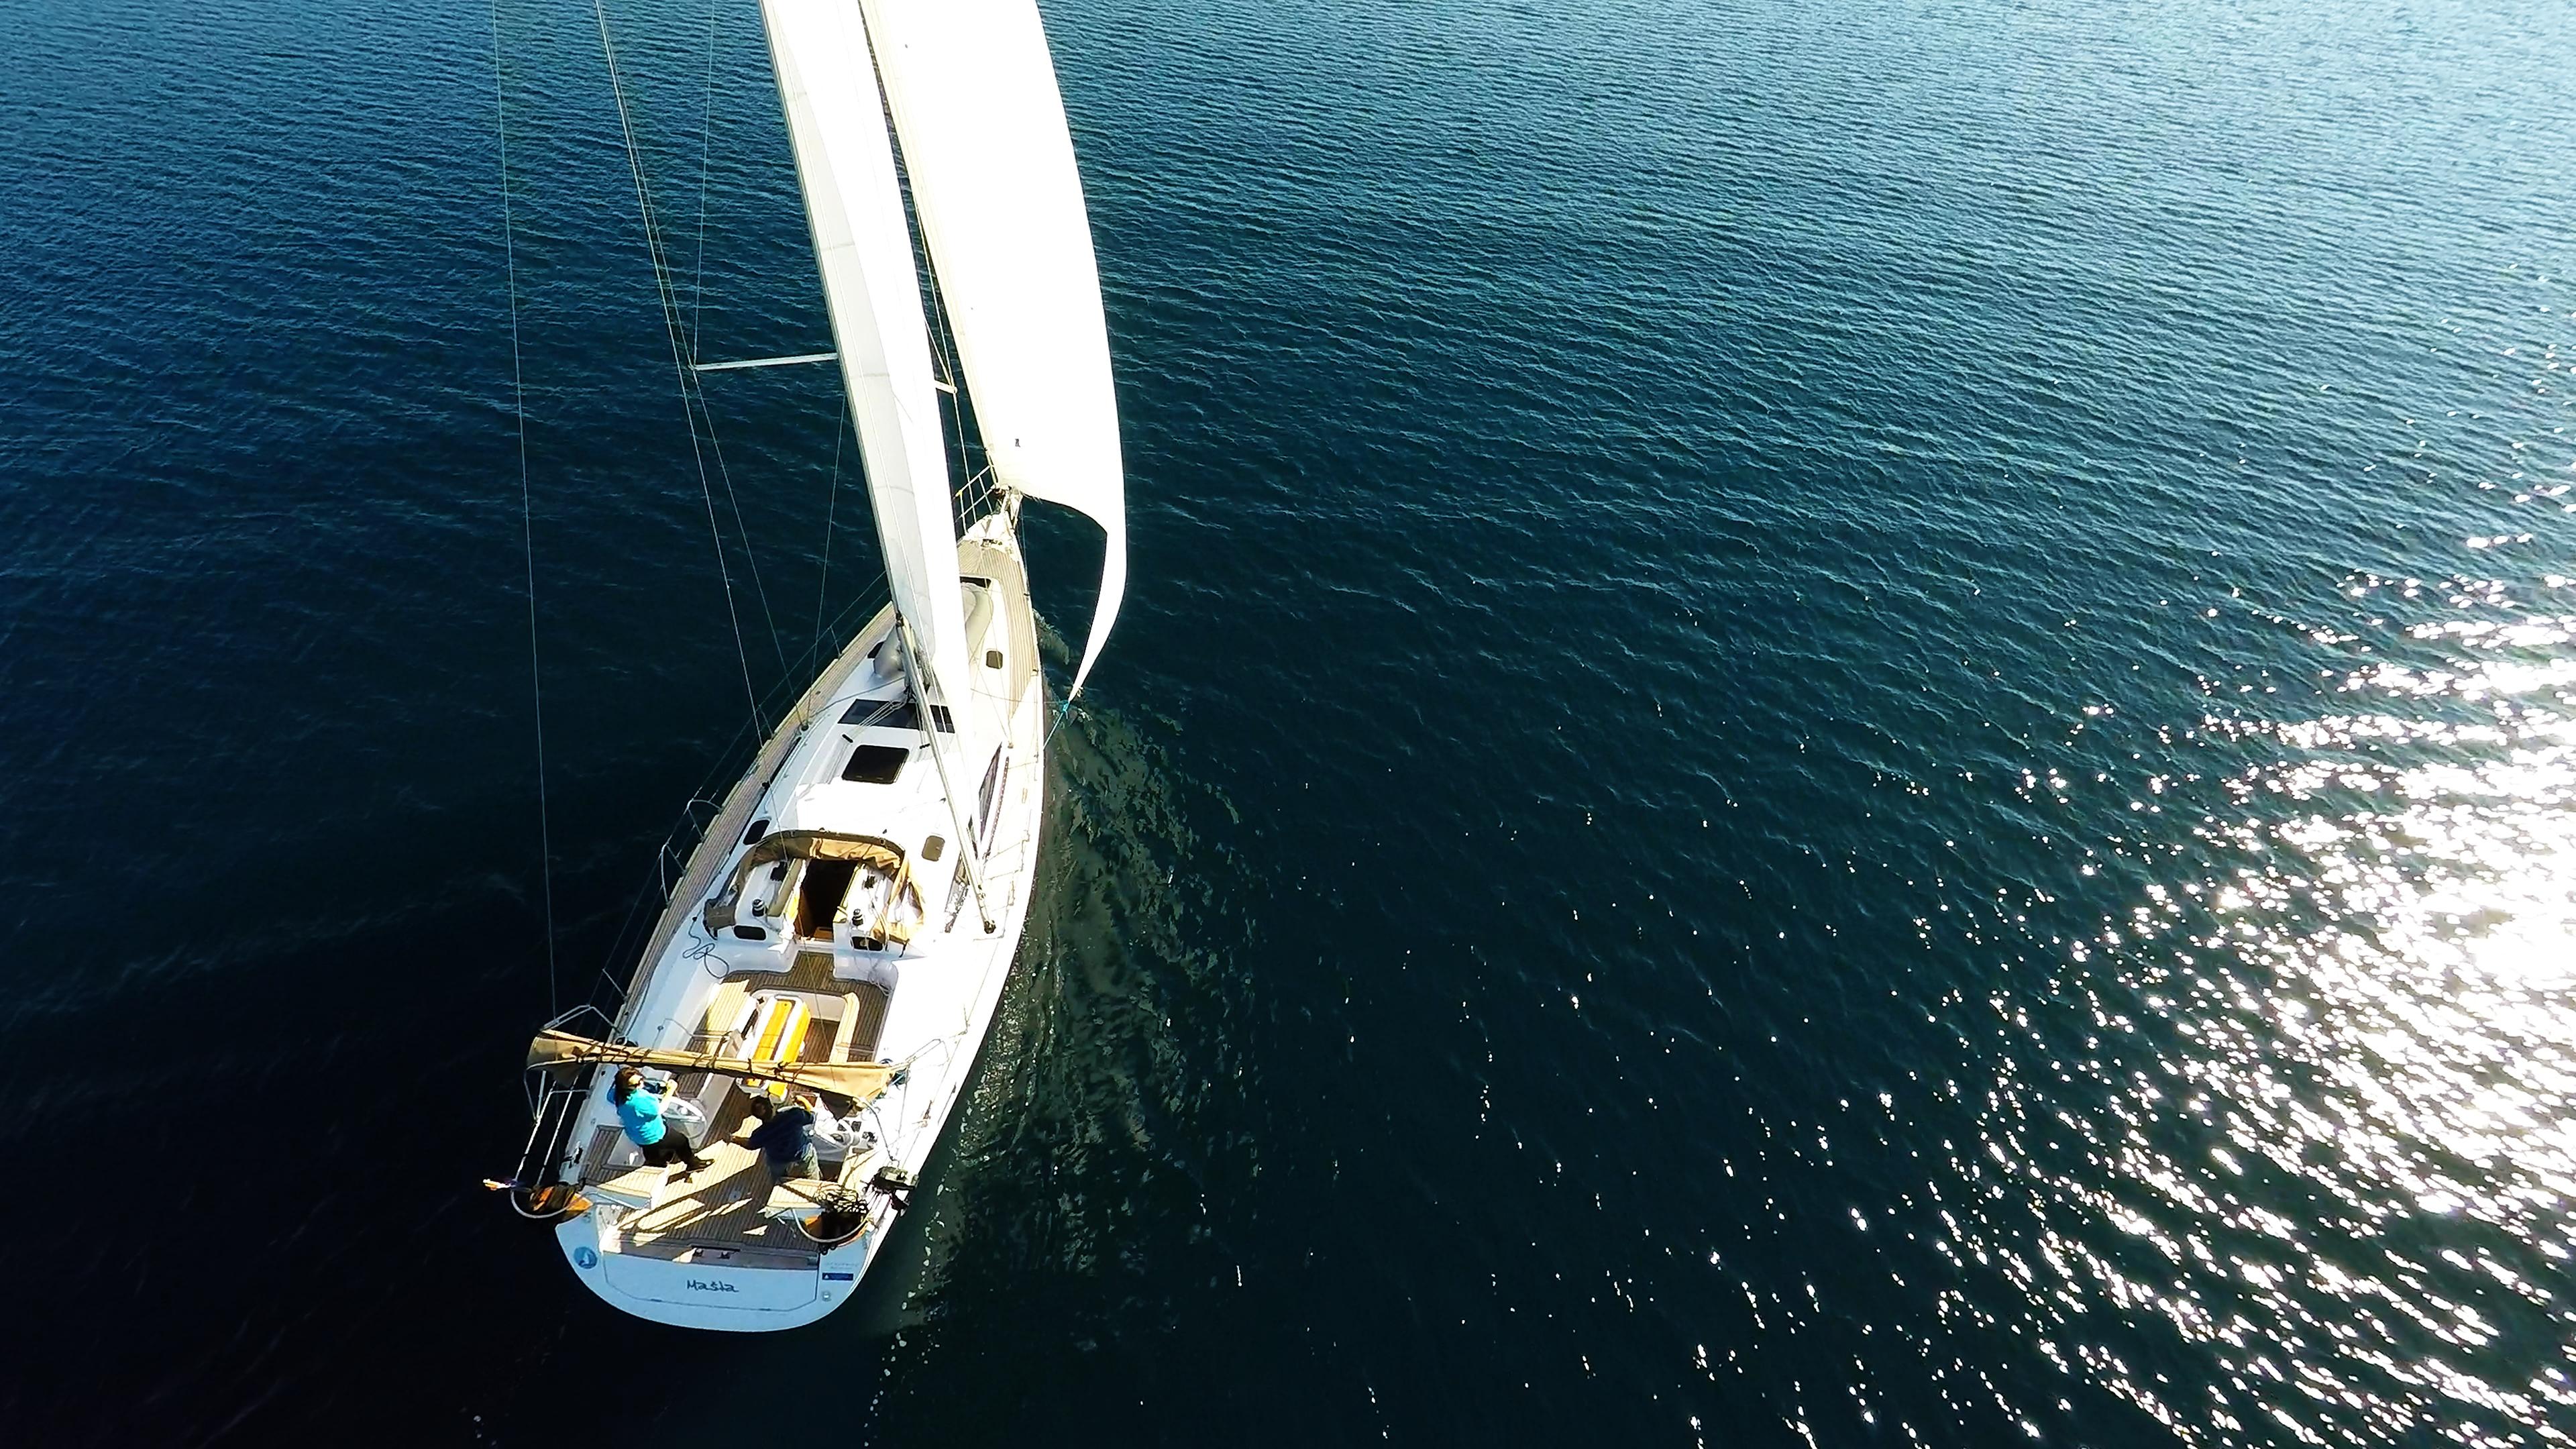 barcha a vela yacht a vela elan 45 impression ponte vele timoni ruota barca a vela